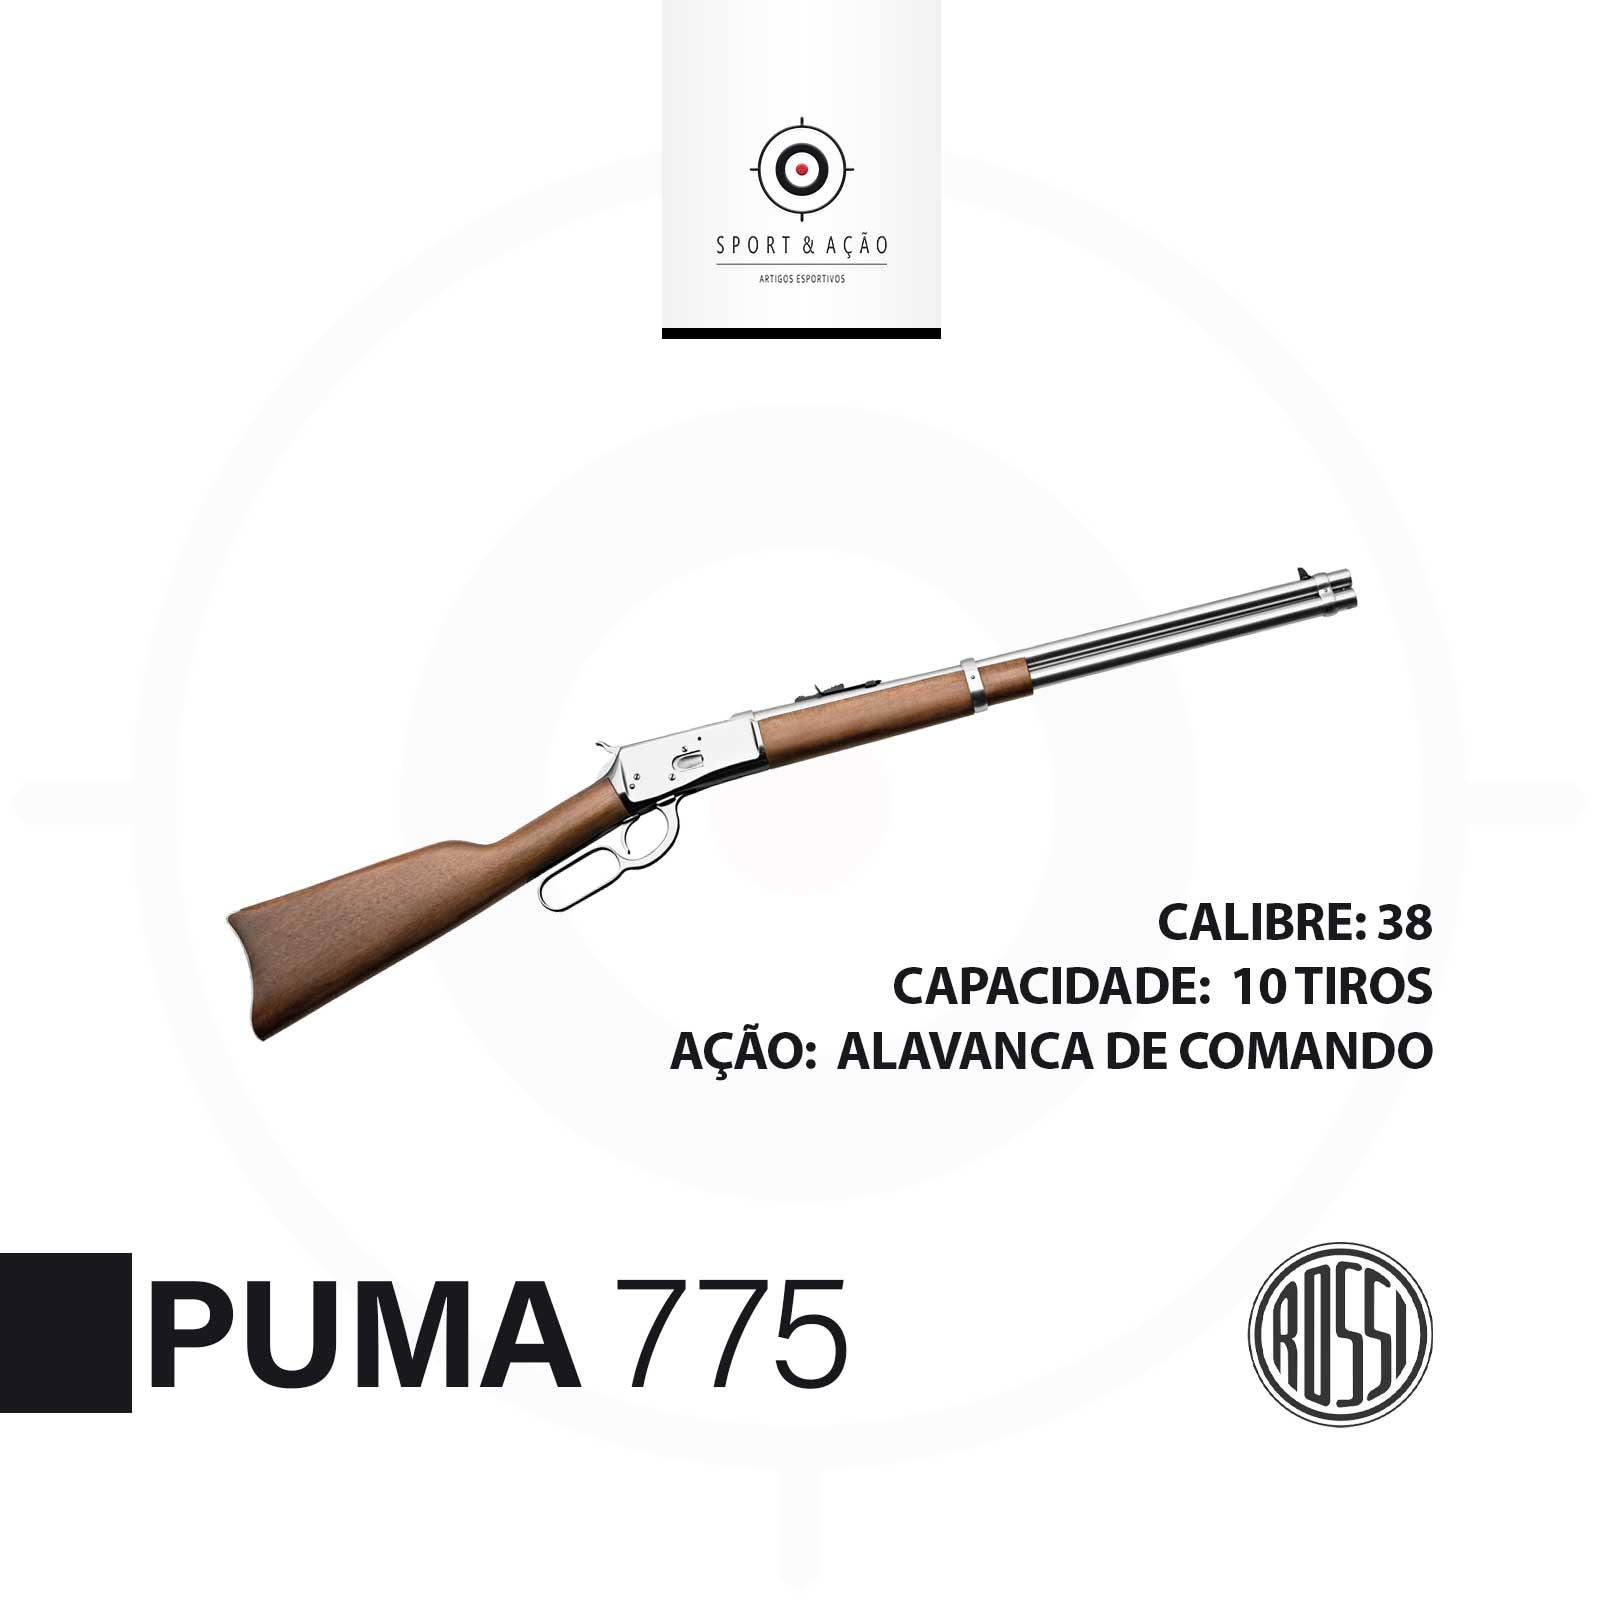 Carabina Rossi Puma Calibre 38 Sport Acao